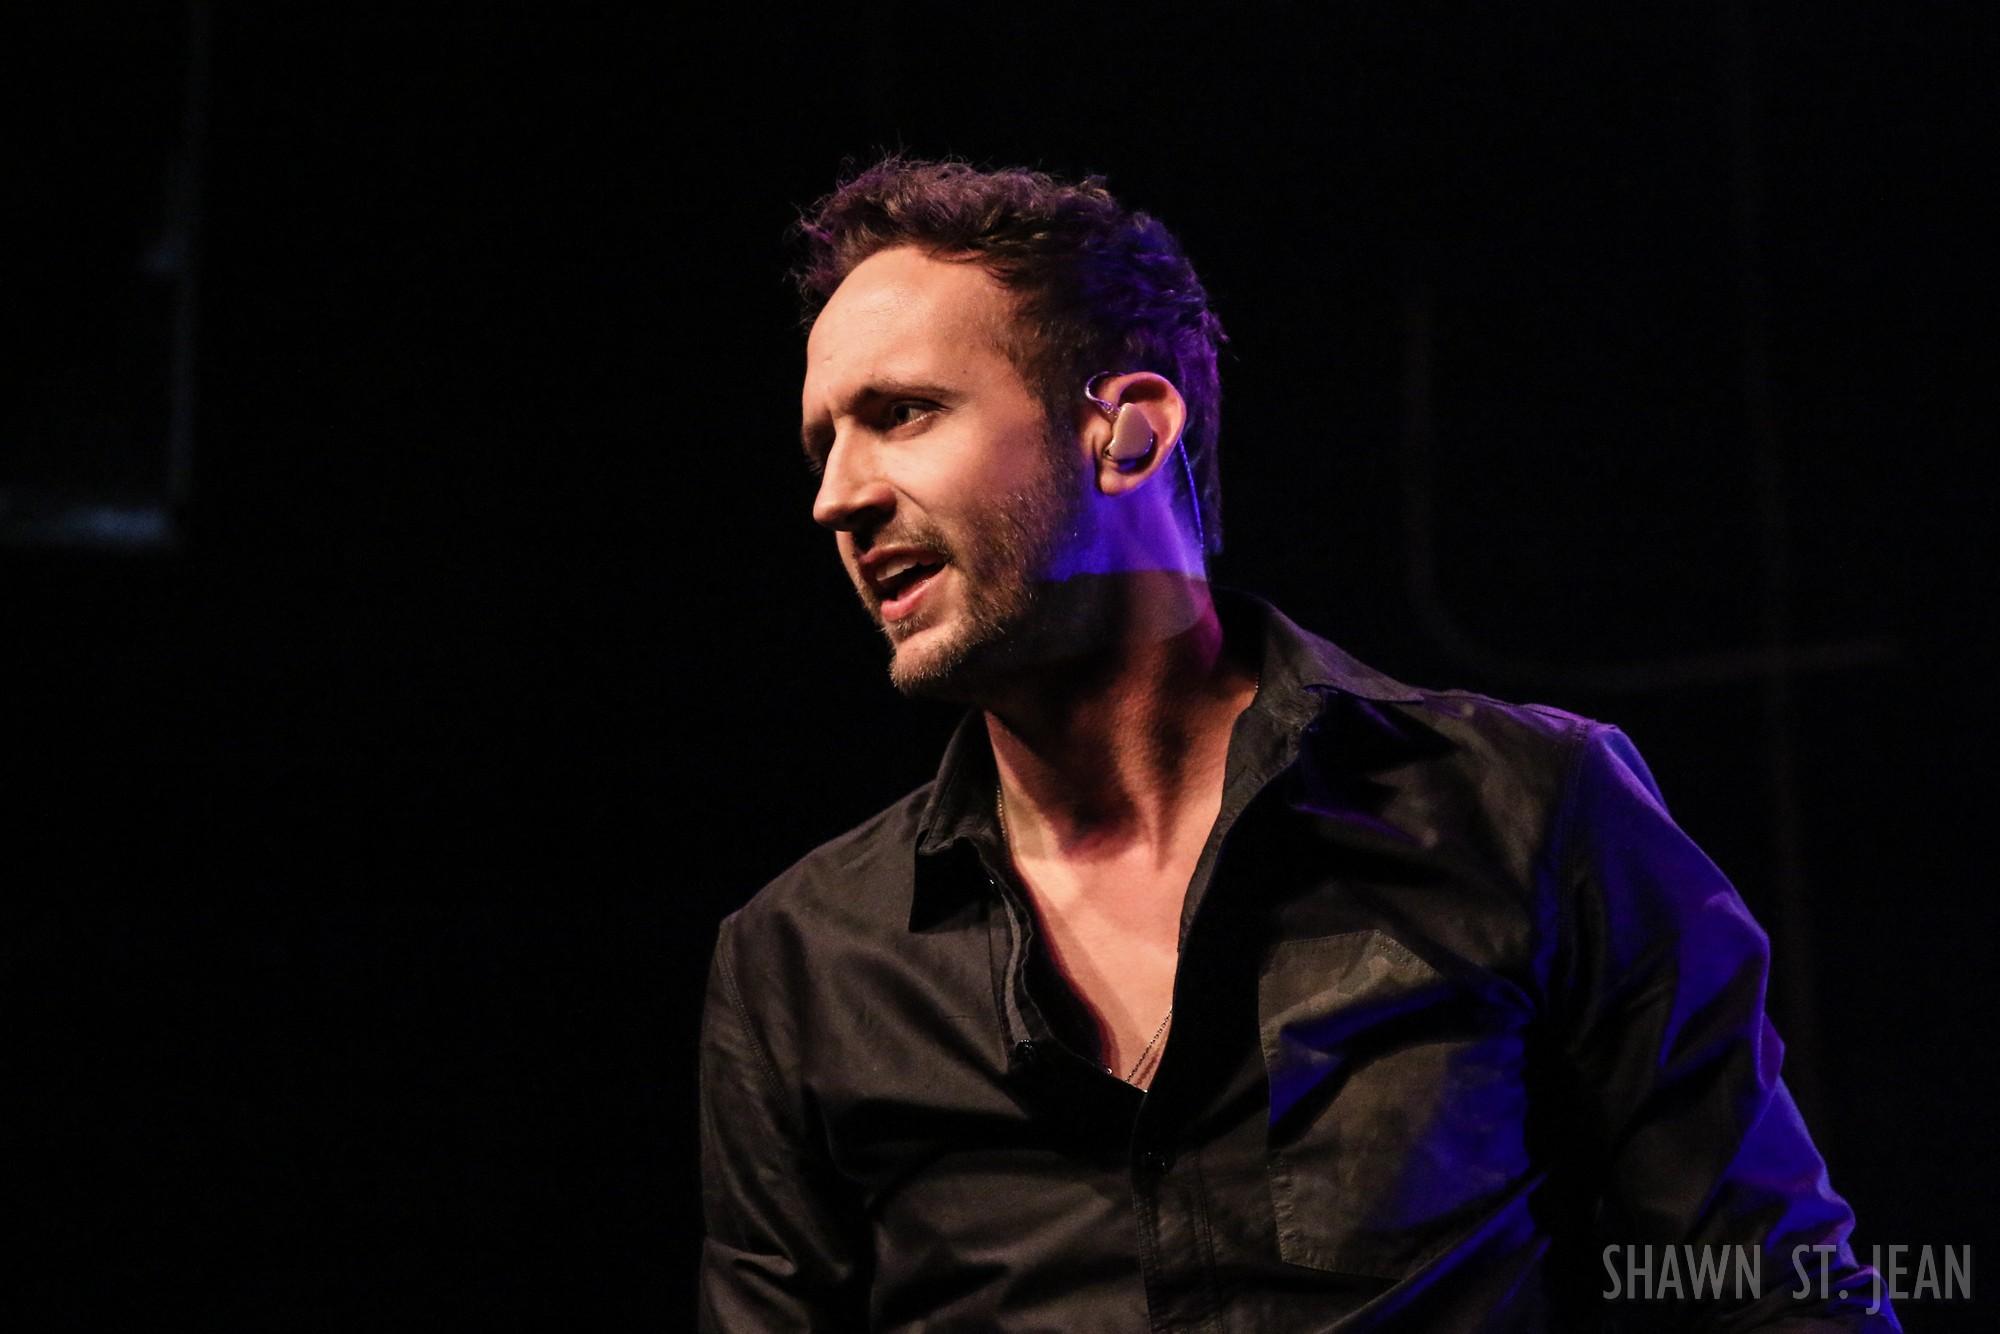 Drew Baldridge at Gramercy Theatre on May 12, 2017 / Photo by Shawn St. Jean.